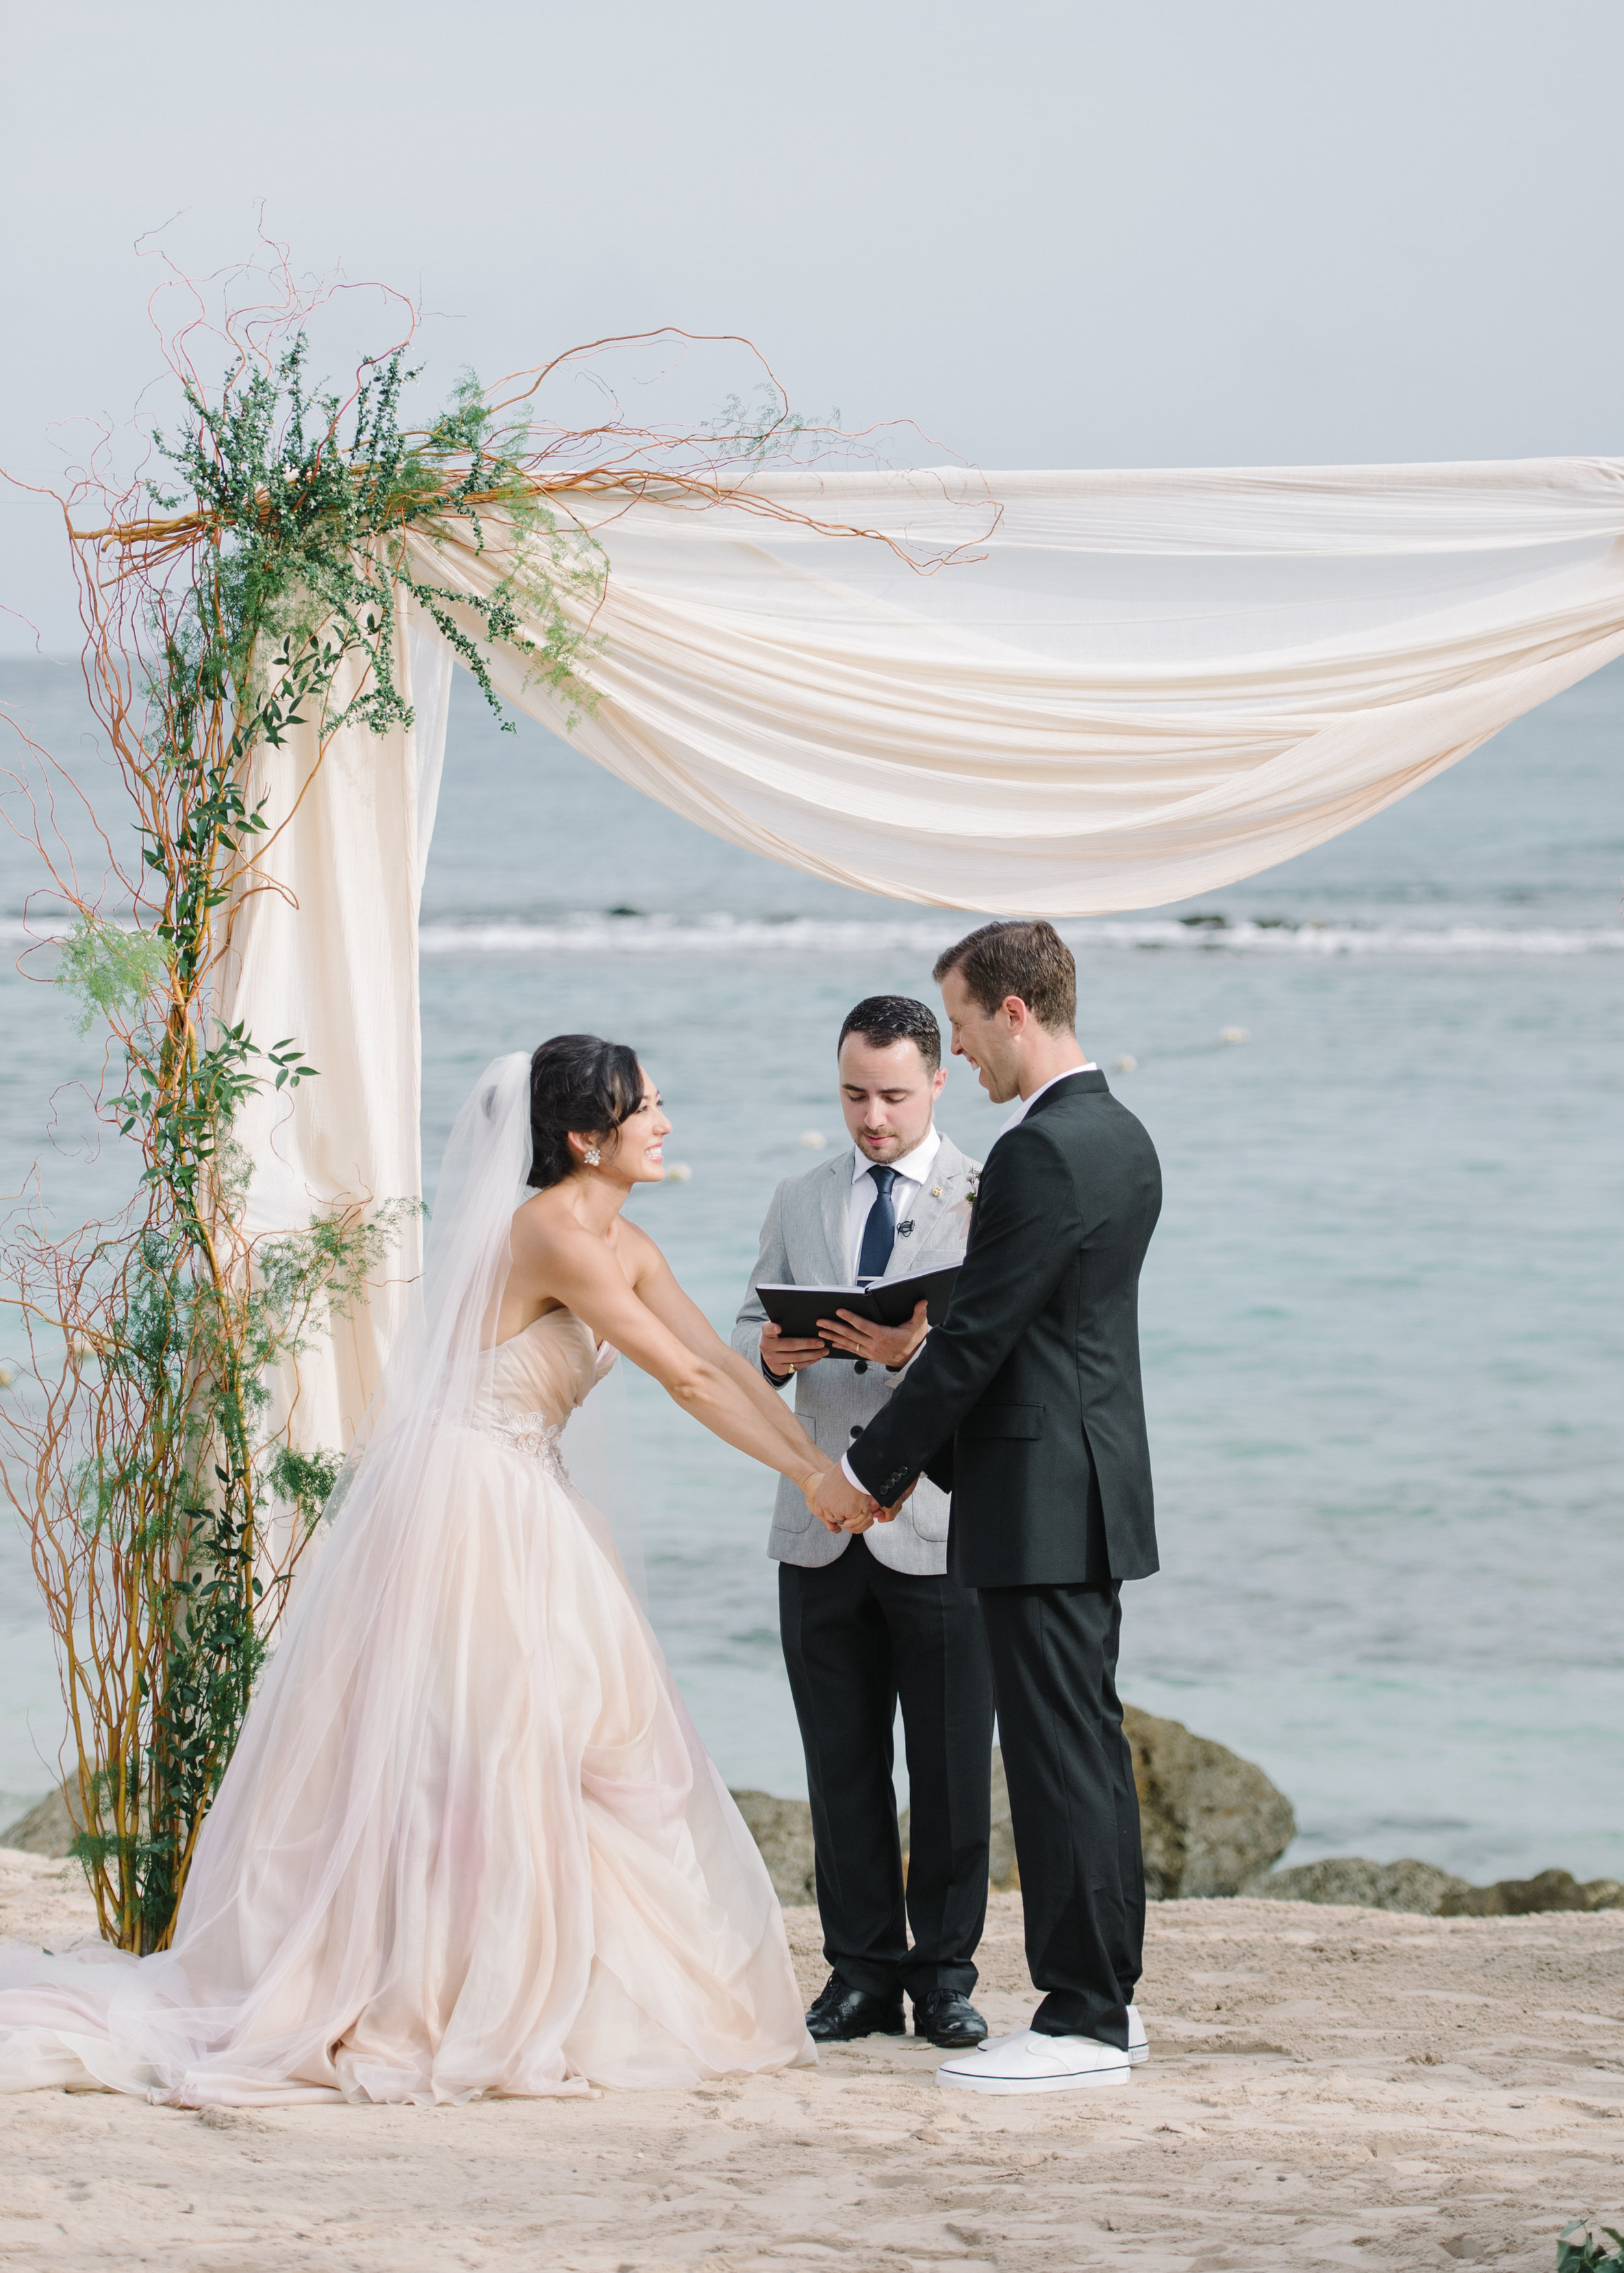 Ashleigh and Brian-Wedding Day-Carrie King Photographer-366.jpg